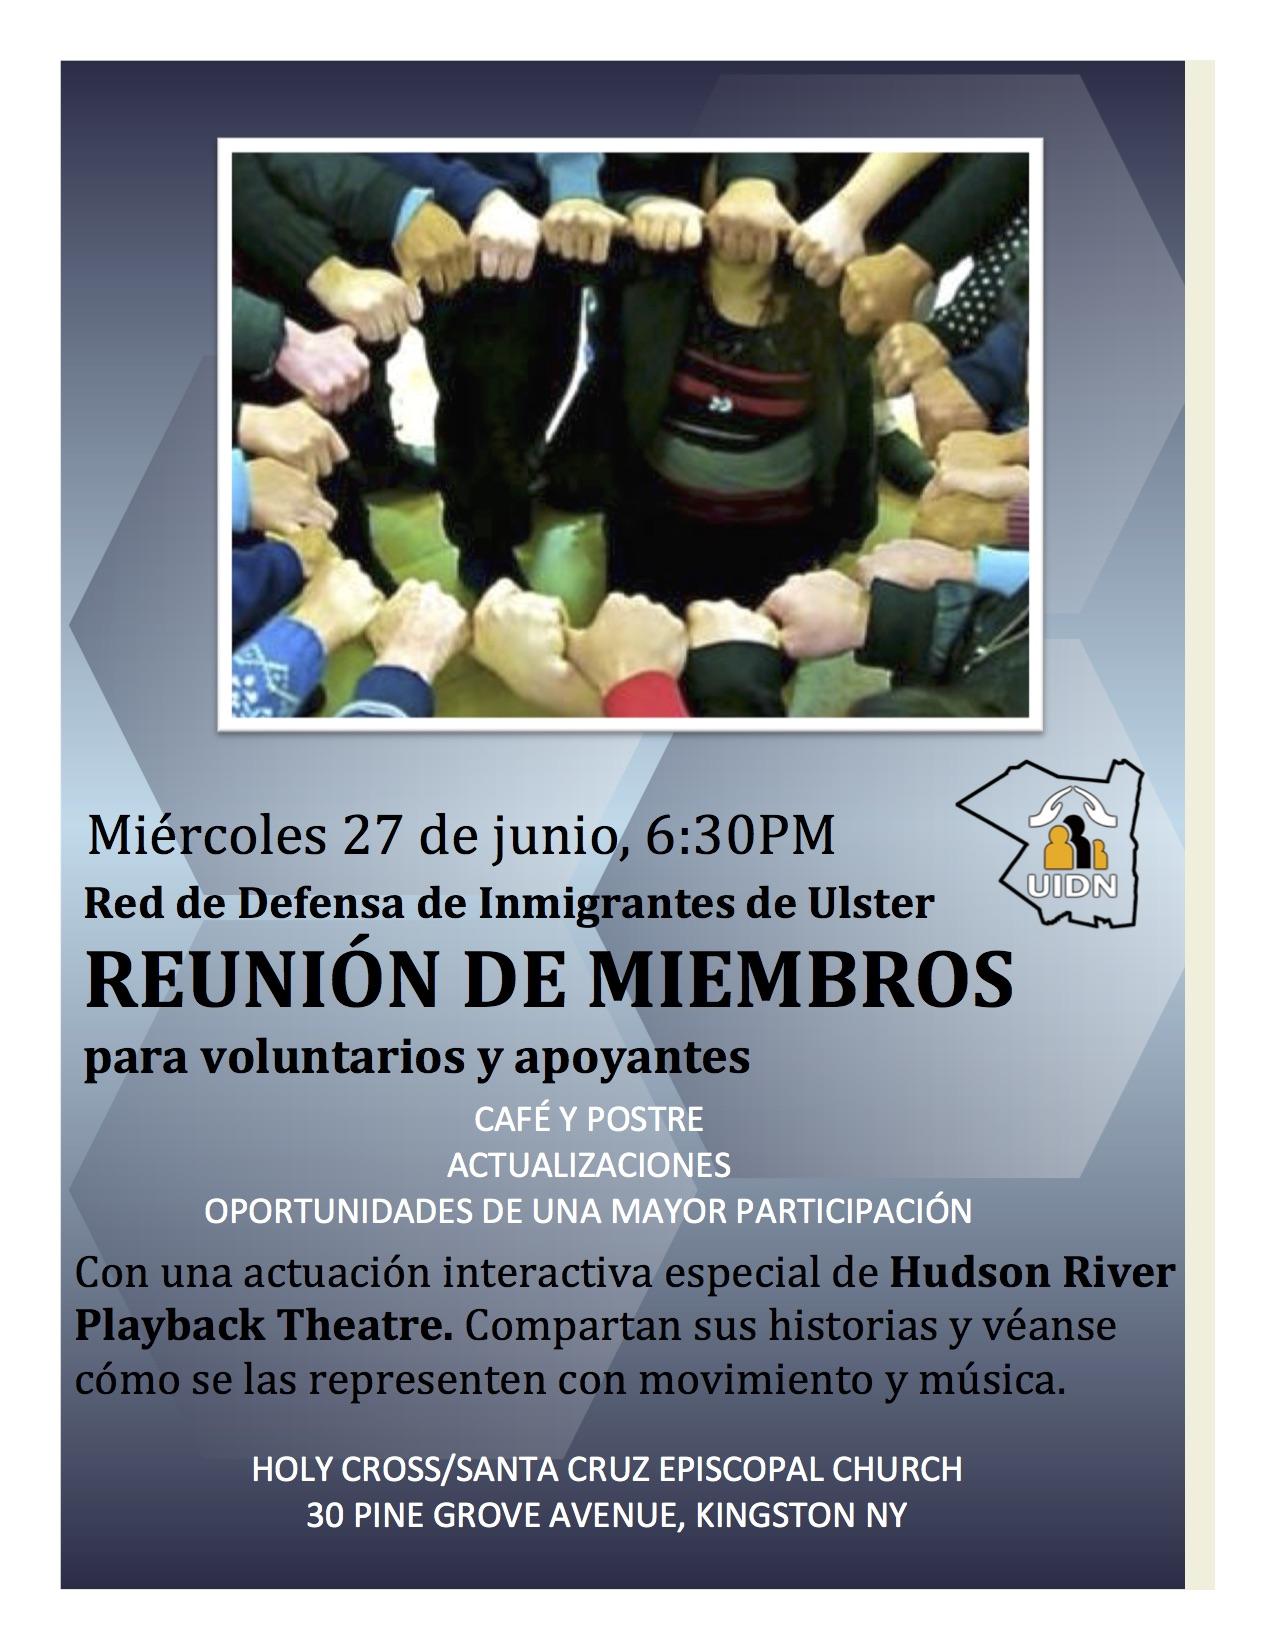 REUNION DE MIEMBROS 27 de junio